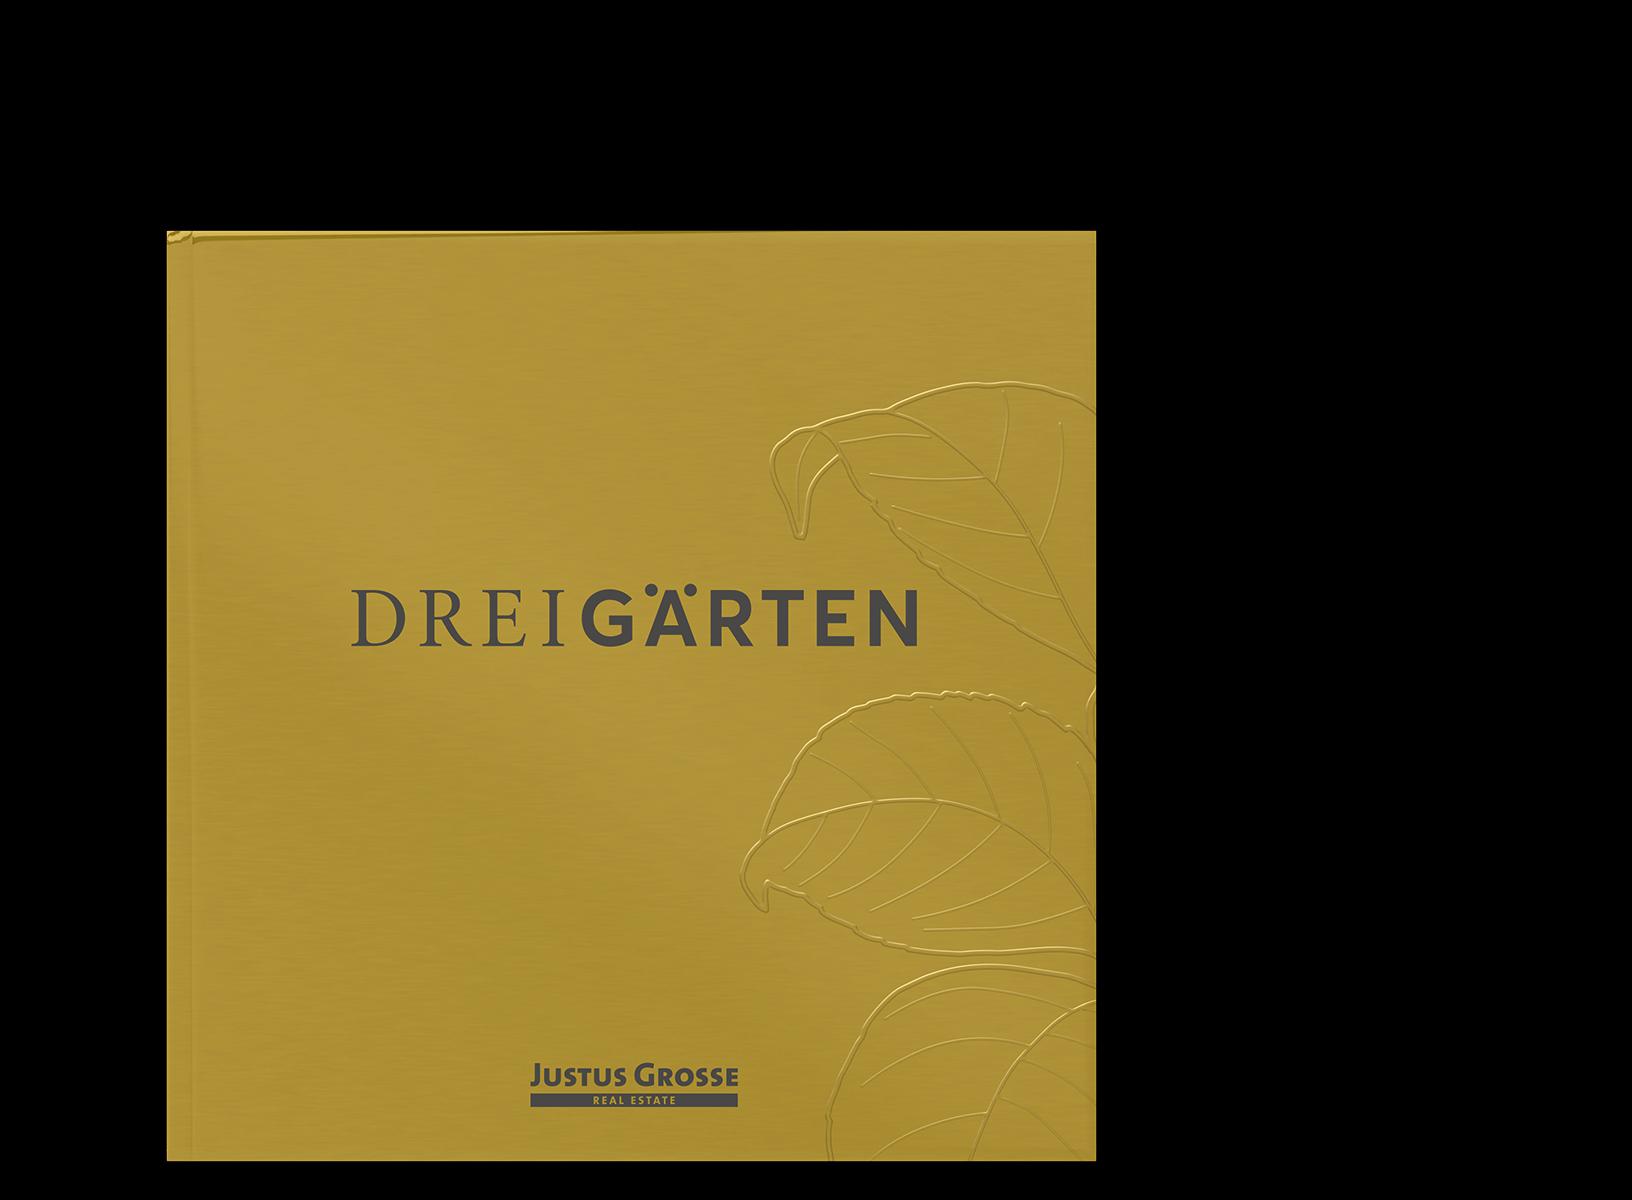 Mockup des Drei Gärten Exposés, Cover des Zusatzhefts